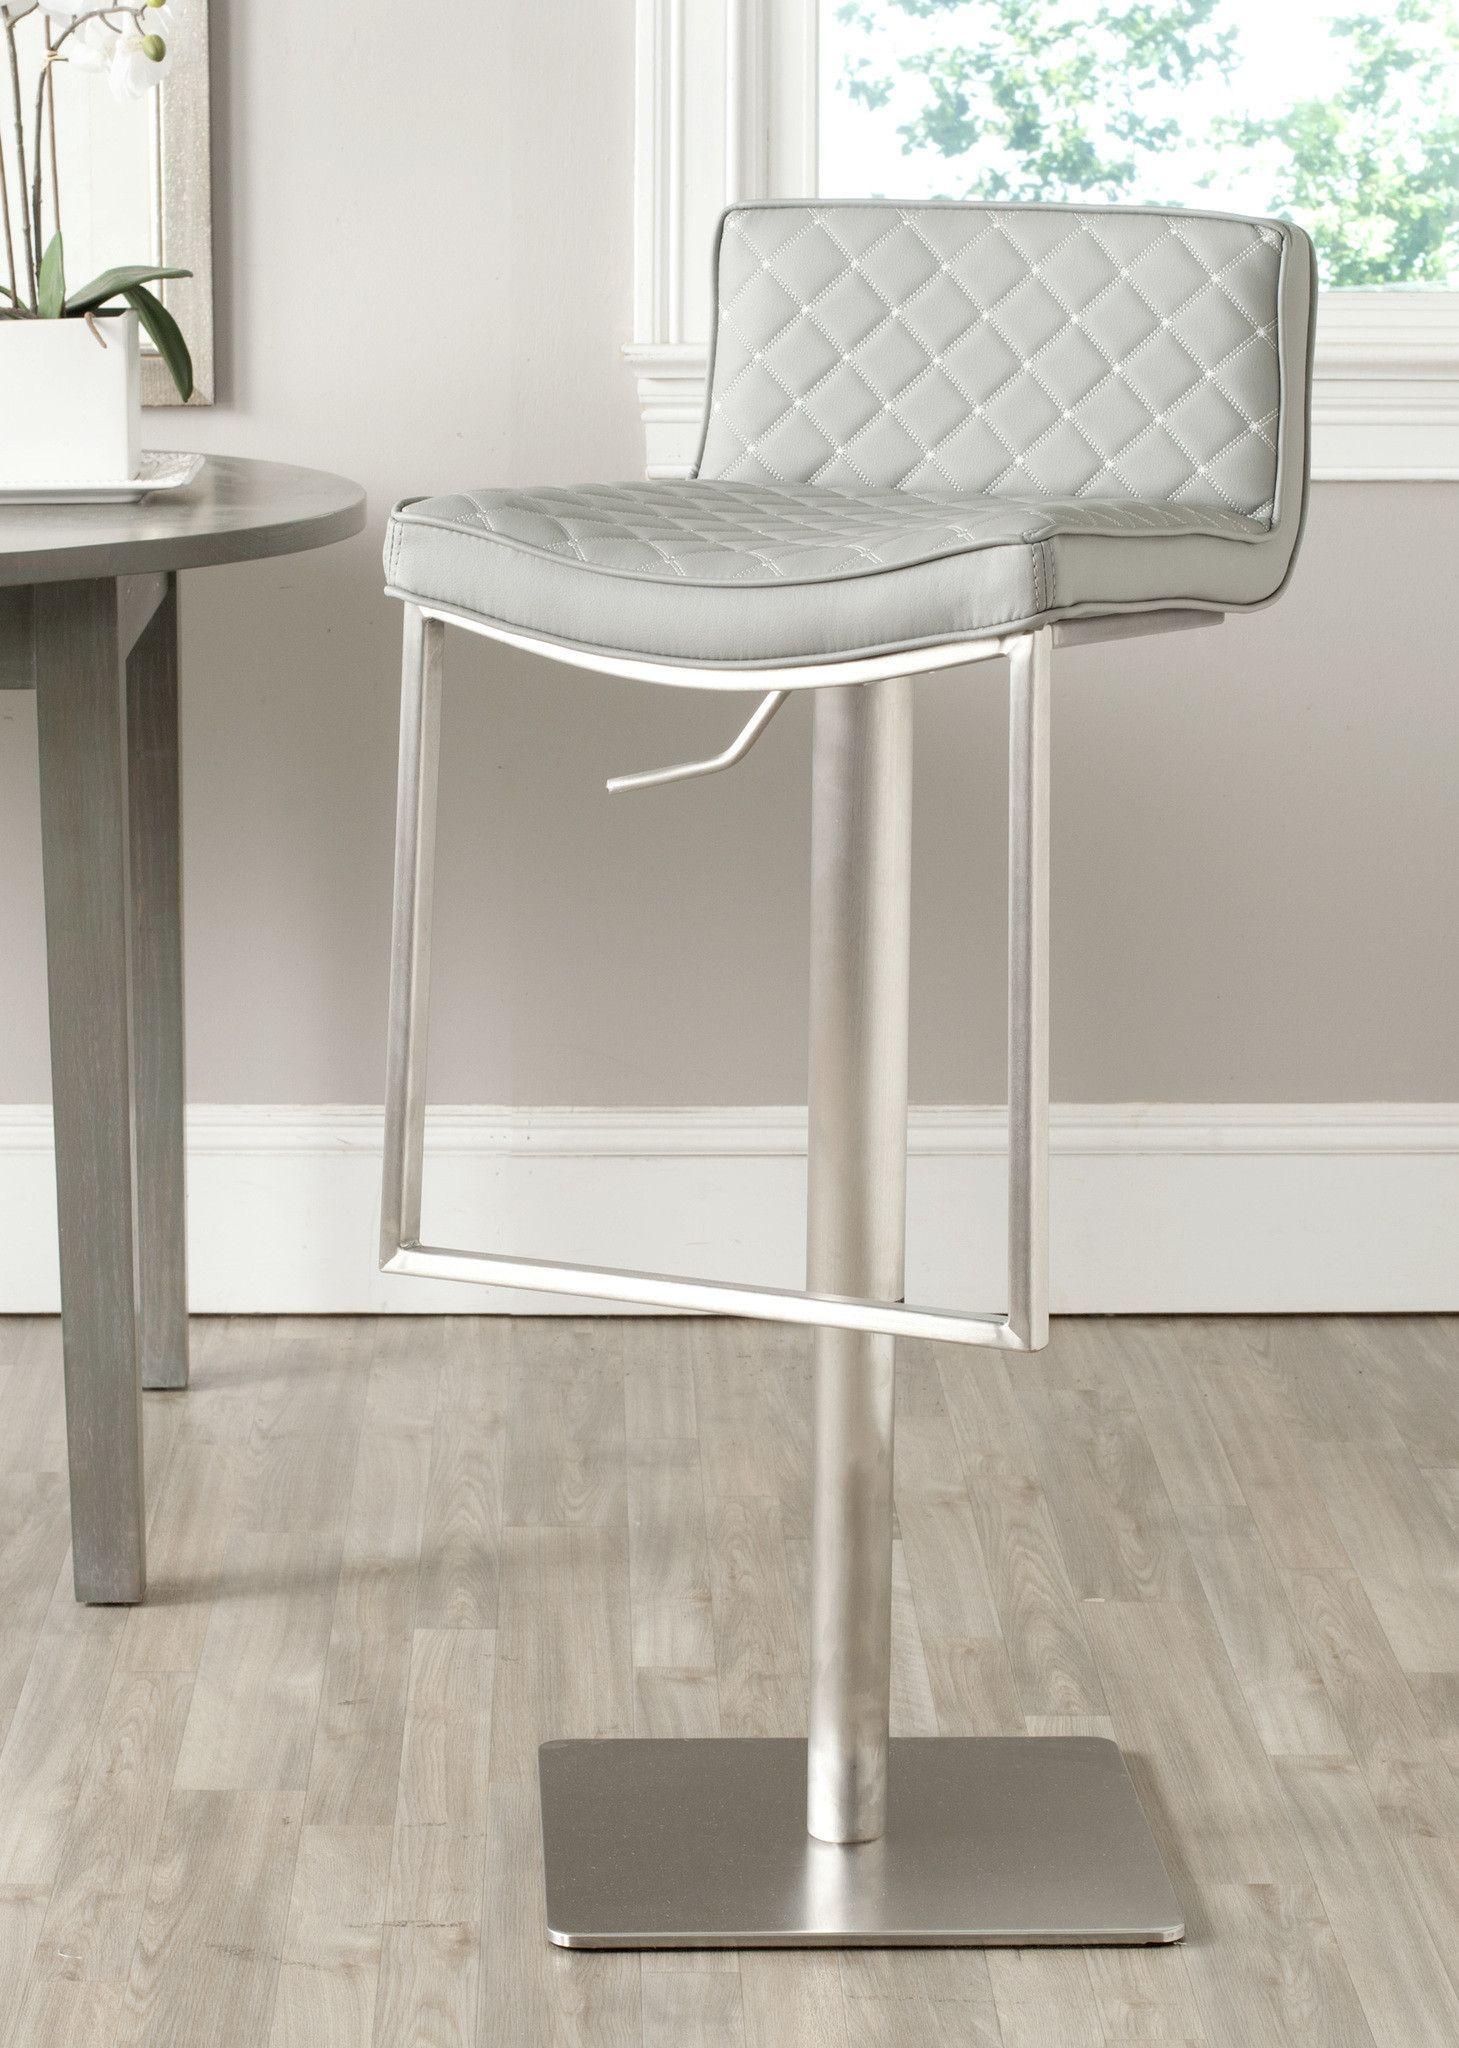 Super Safavieh Claudio Swivel Barstool Barstool Bar Stools Lamtechconsult Wood Chair Design Ideas Lamtechconsultcom